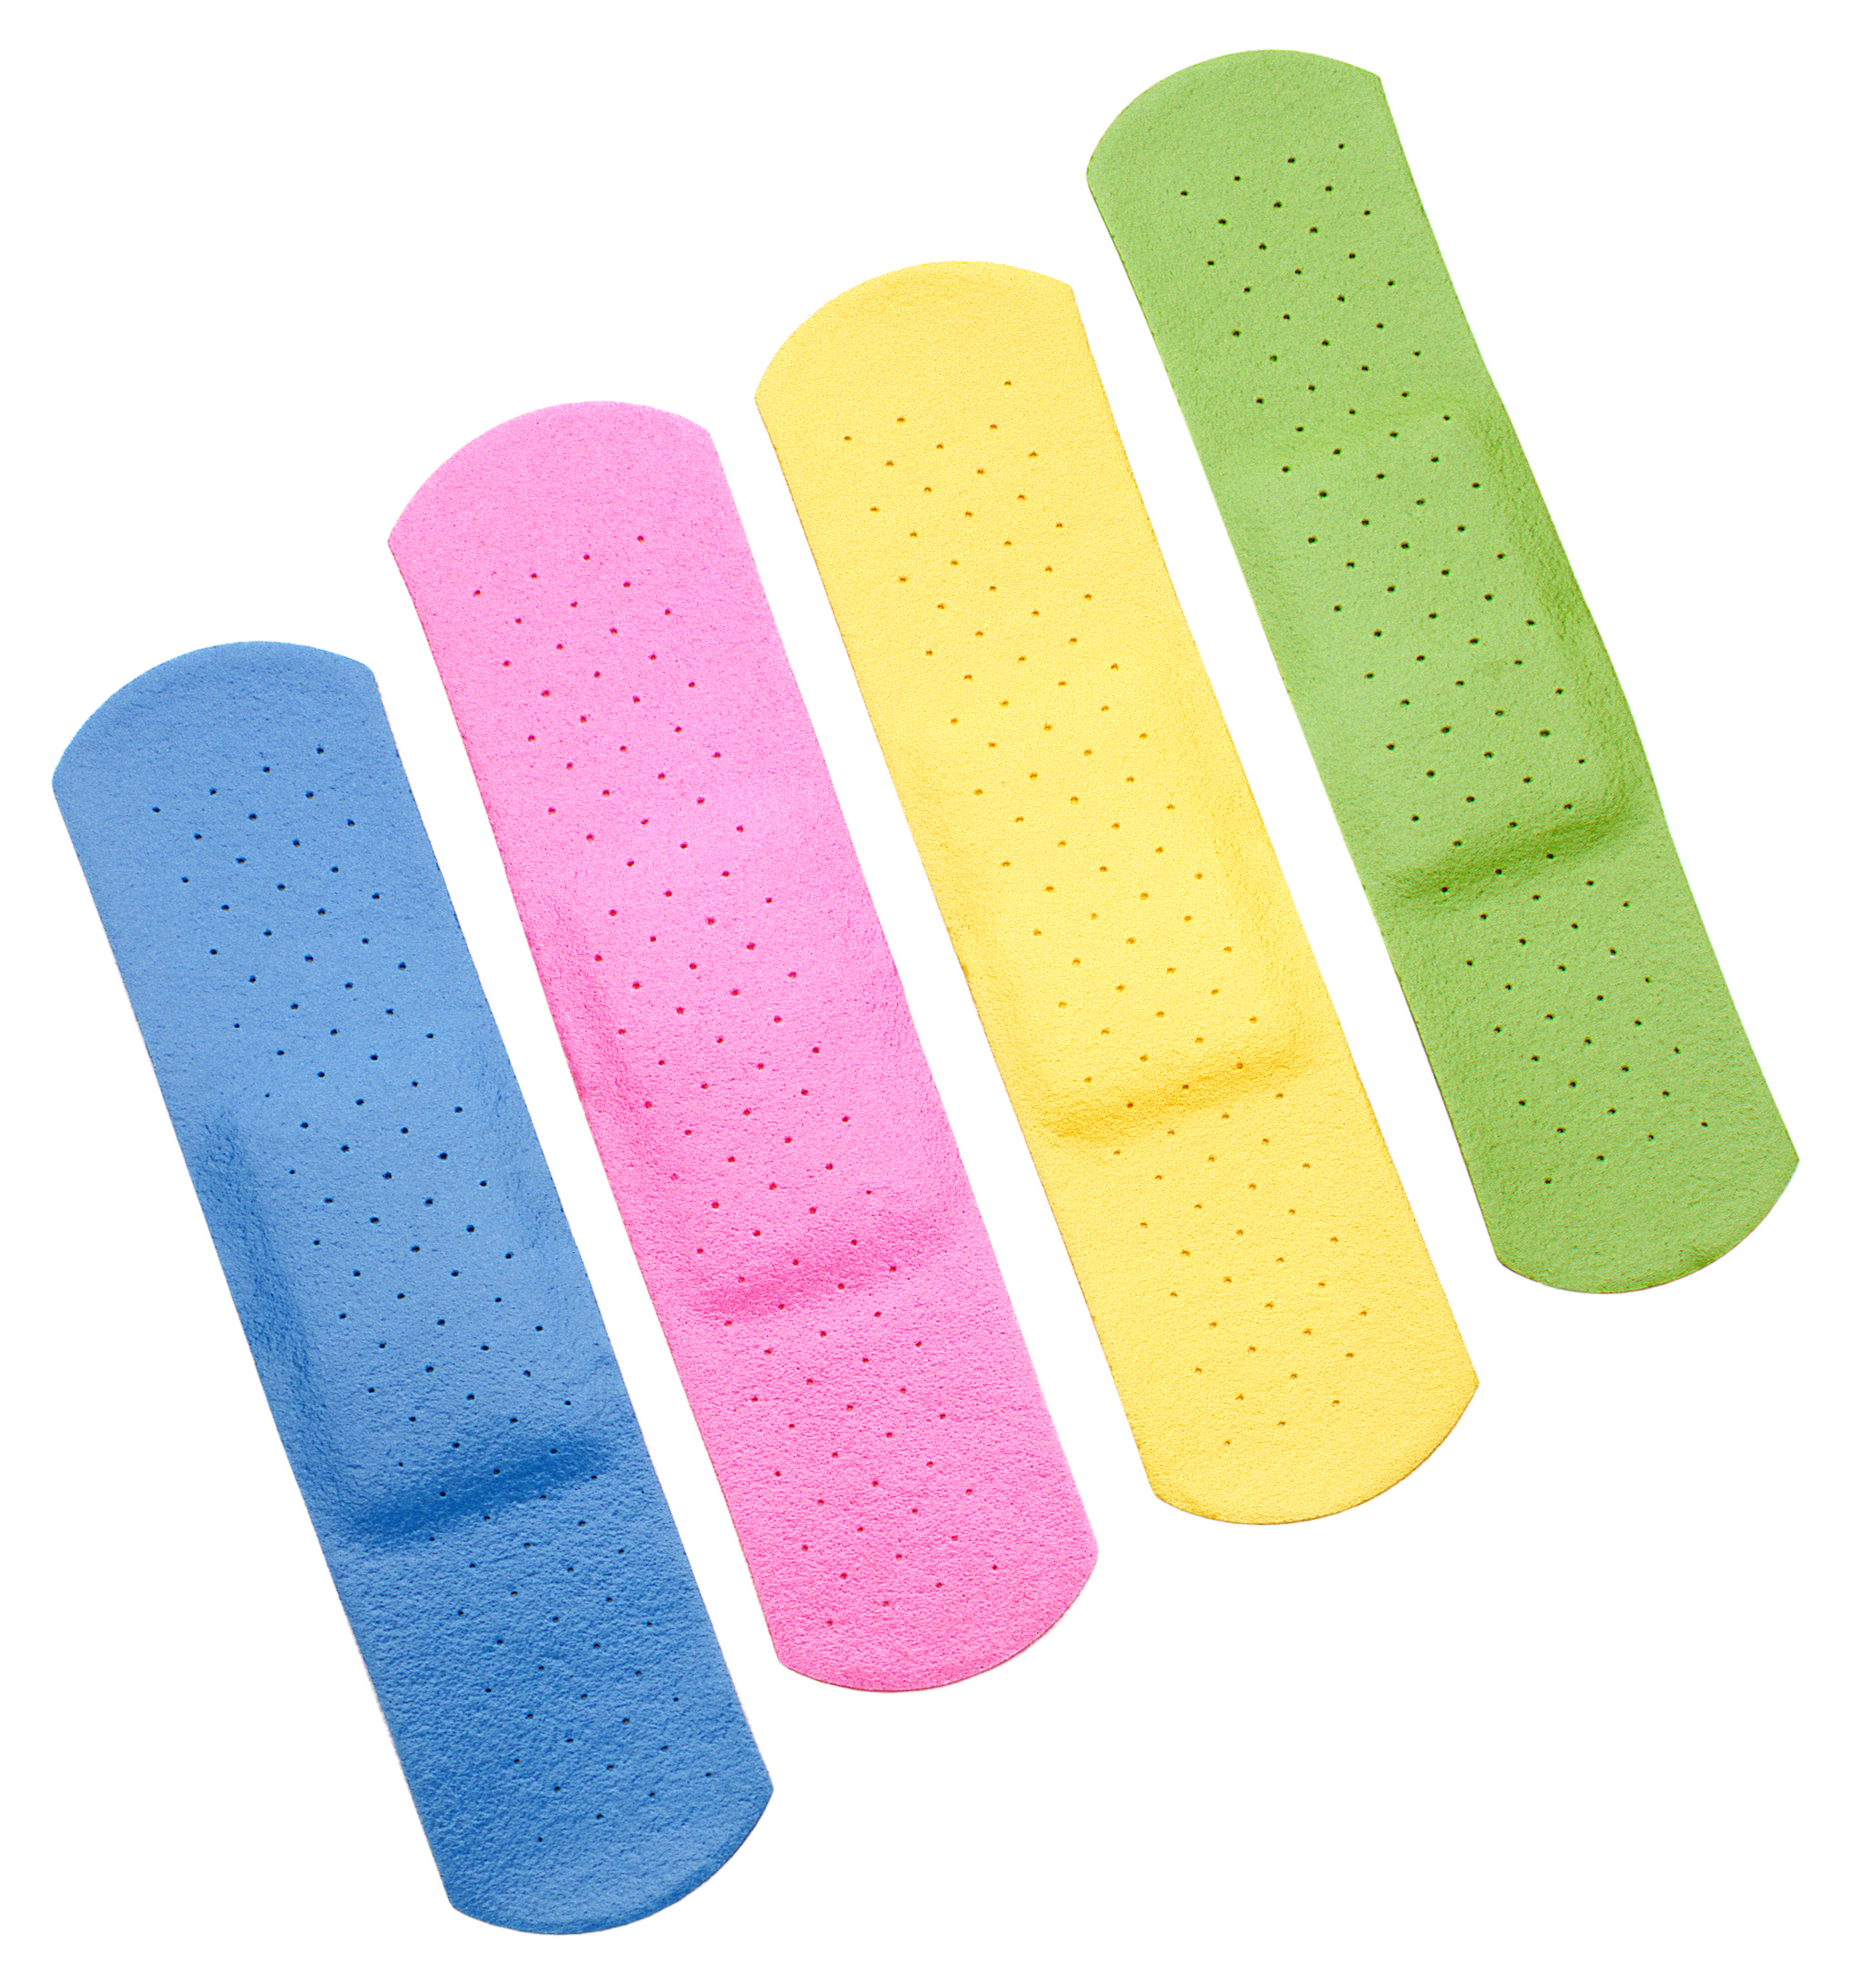 2025x2175 Bandaid Band Aid Clip Art Colorful Band Aid Clip Art Photo Image